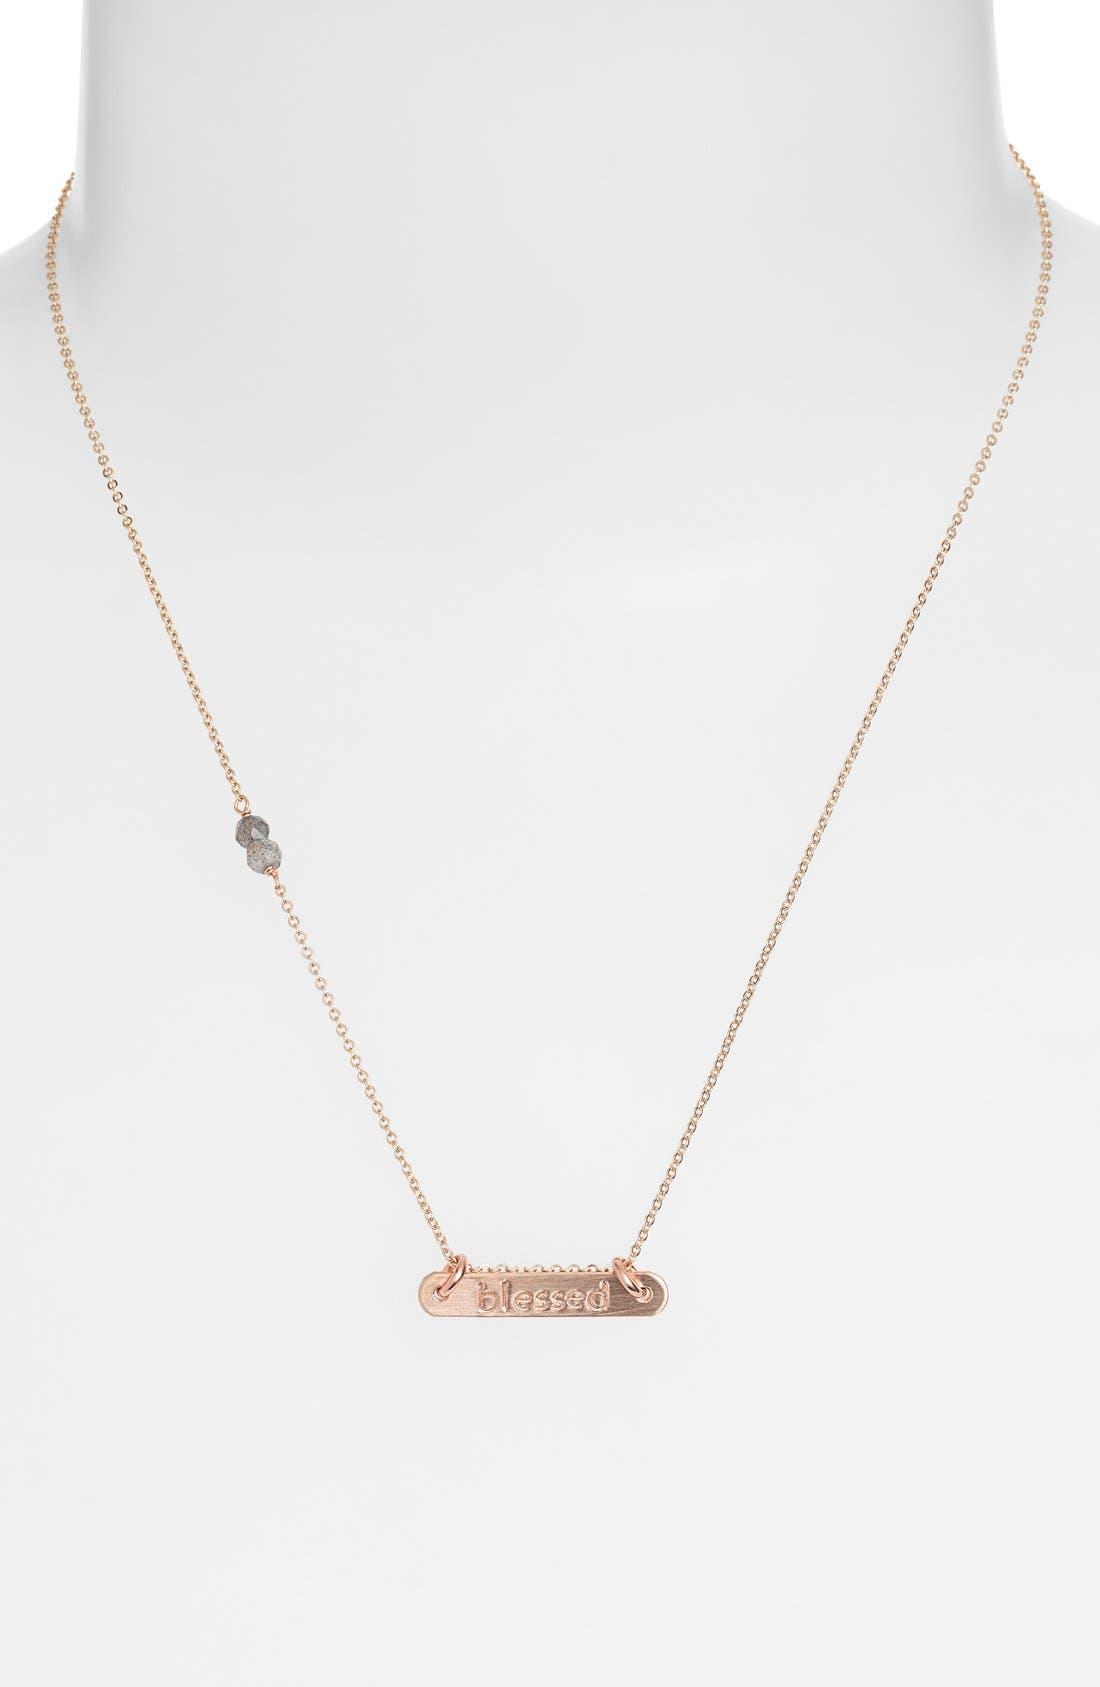 Alternate Image 2  - Nashelle 'Blessed' 14k Gold-Fill Bar Necklace